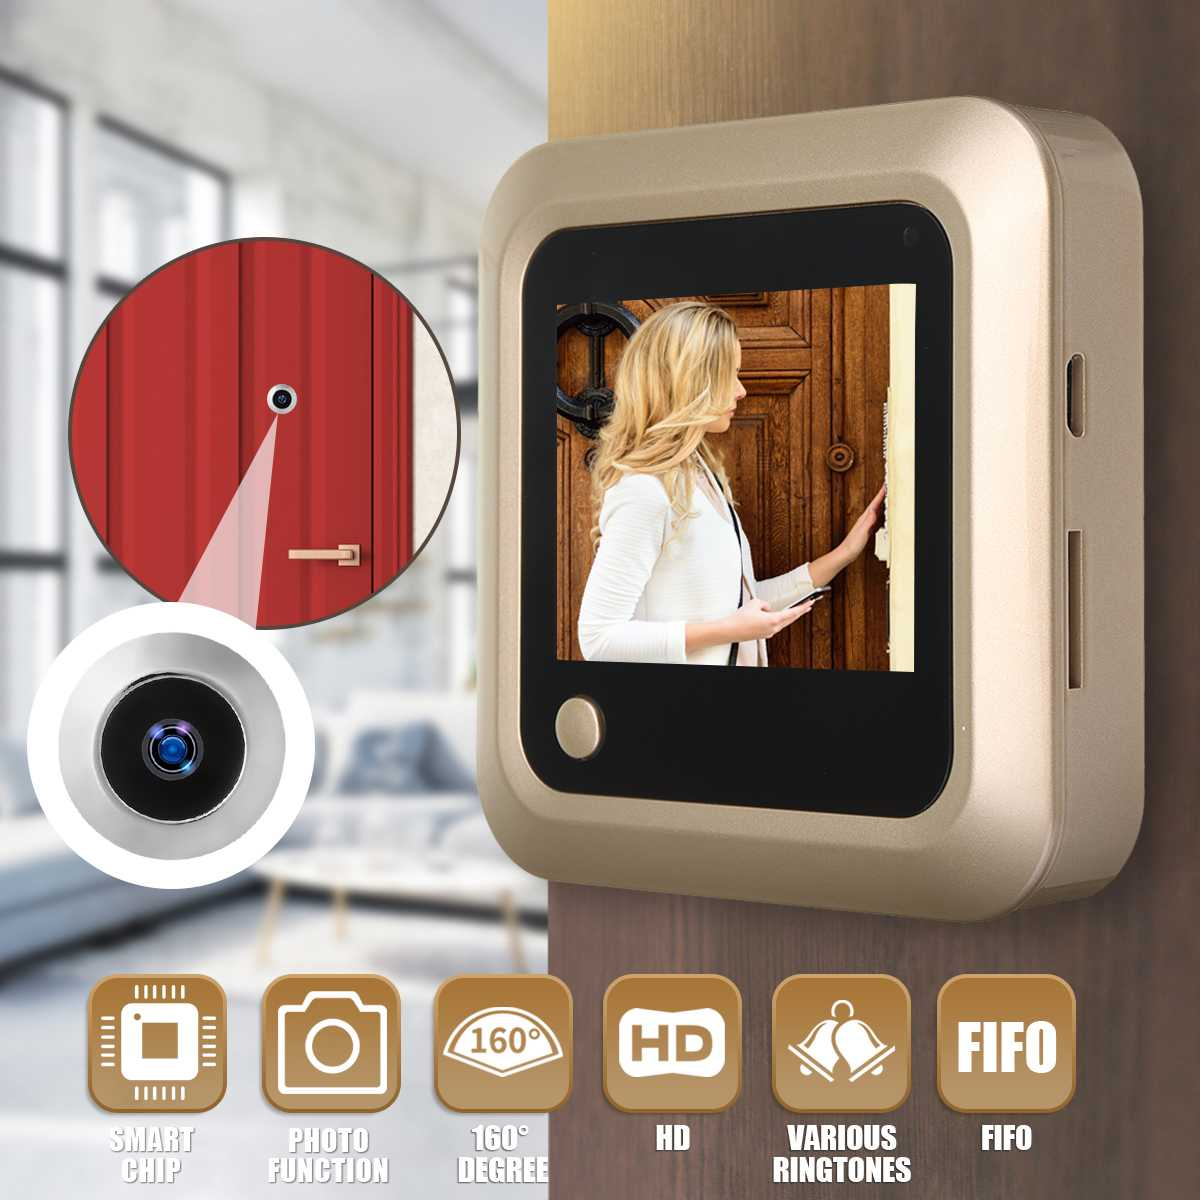 Digital LCD 2.4inch Video Doorbell Peephole Viewer Door Eye Monitoring Camera 160 Degree Doorbell